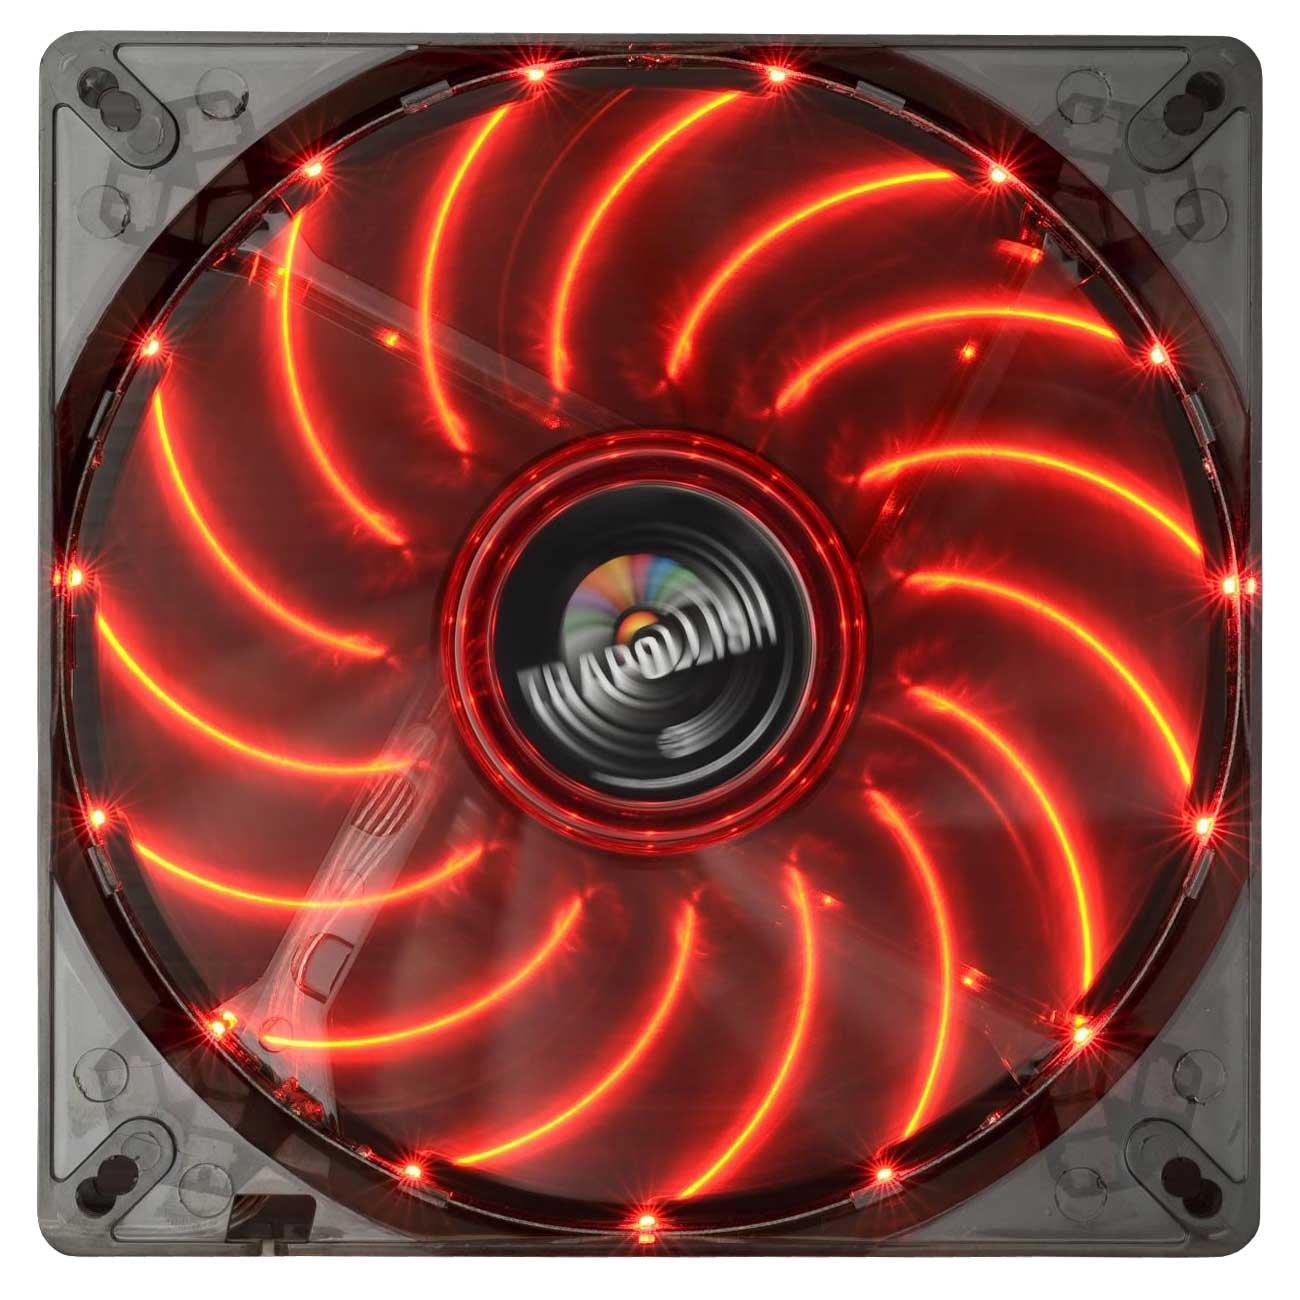 WTB fans de 80, ou de 90 ou de 120 mm à Led 71R9et7X40L._SL1300_